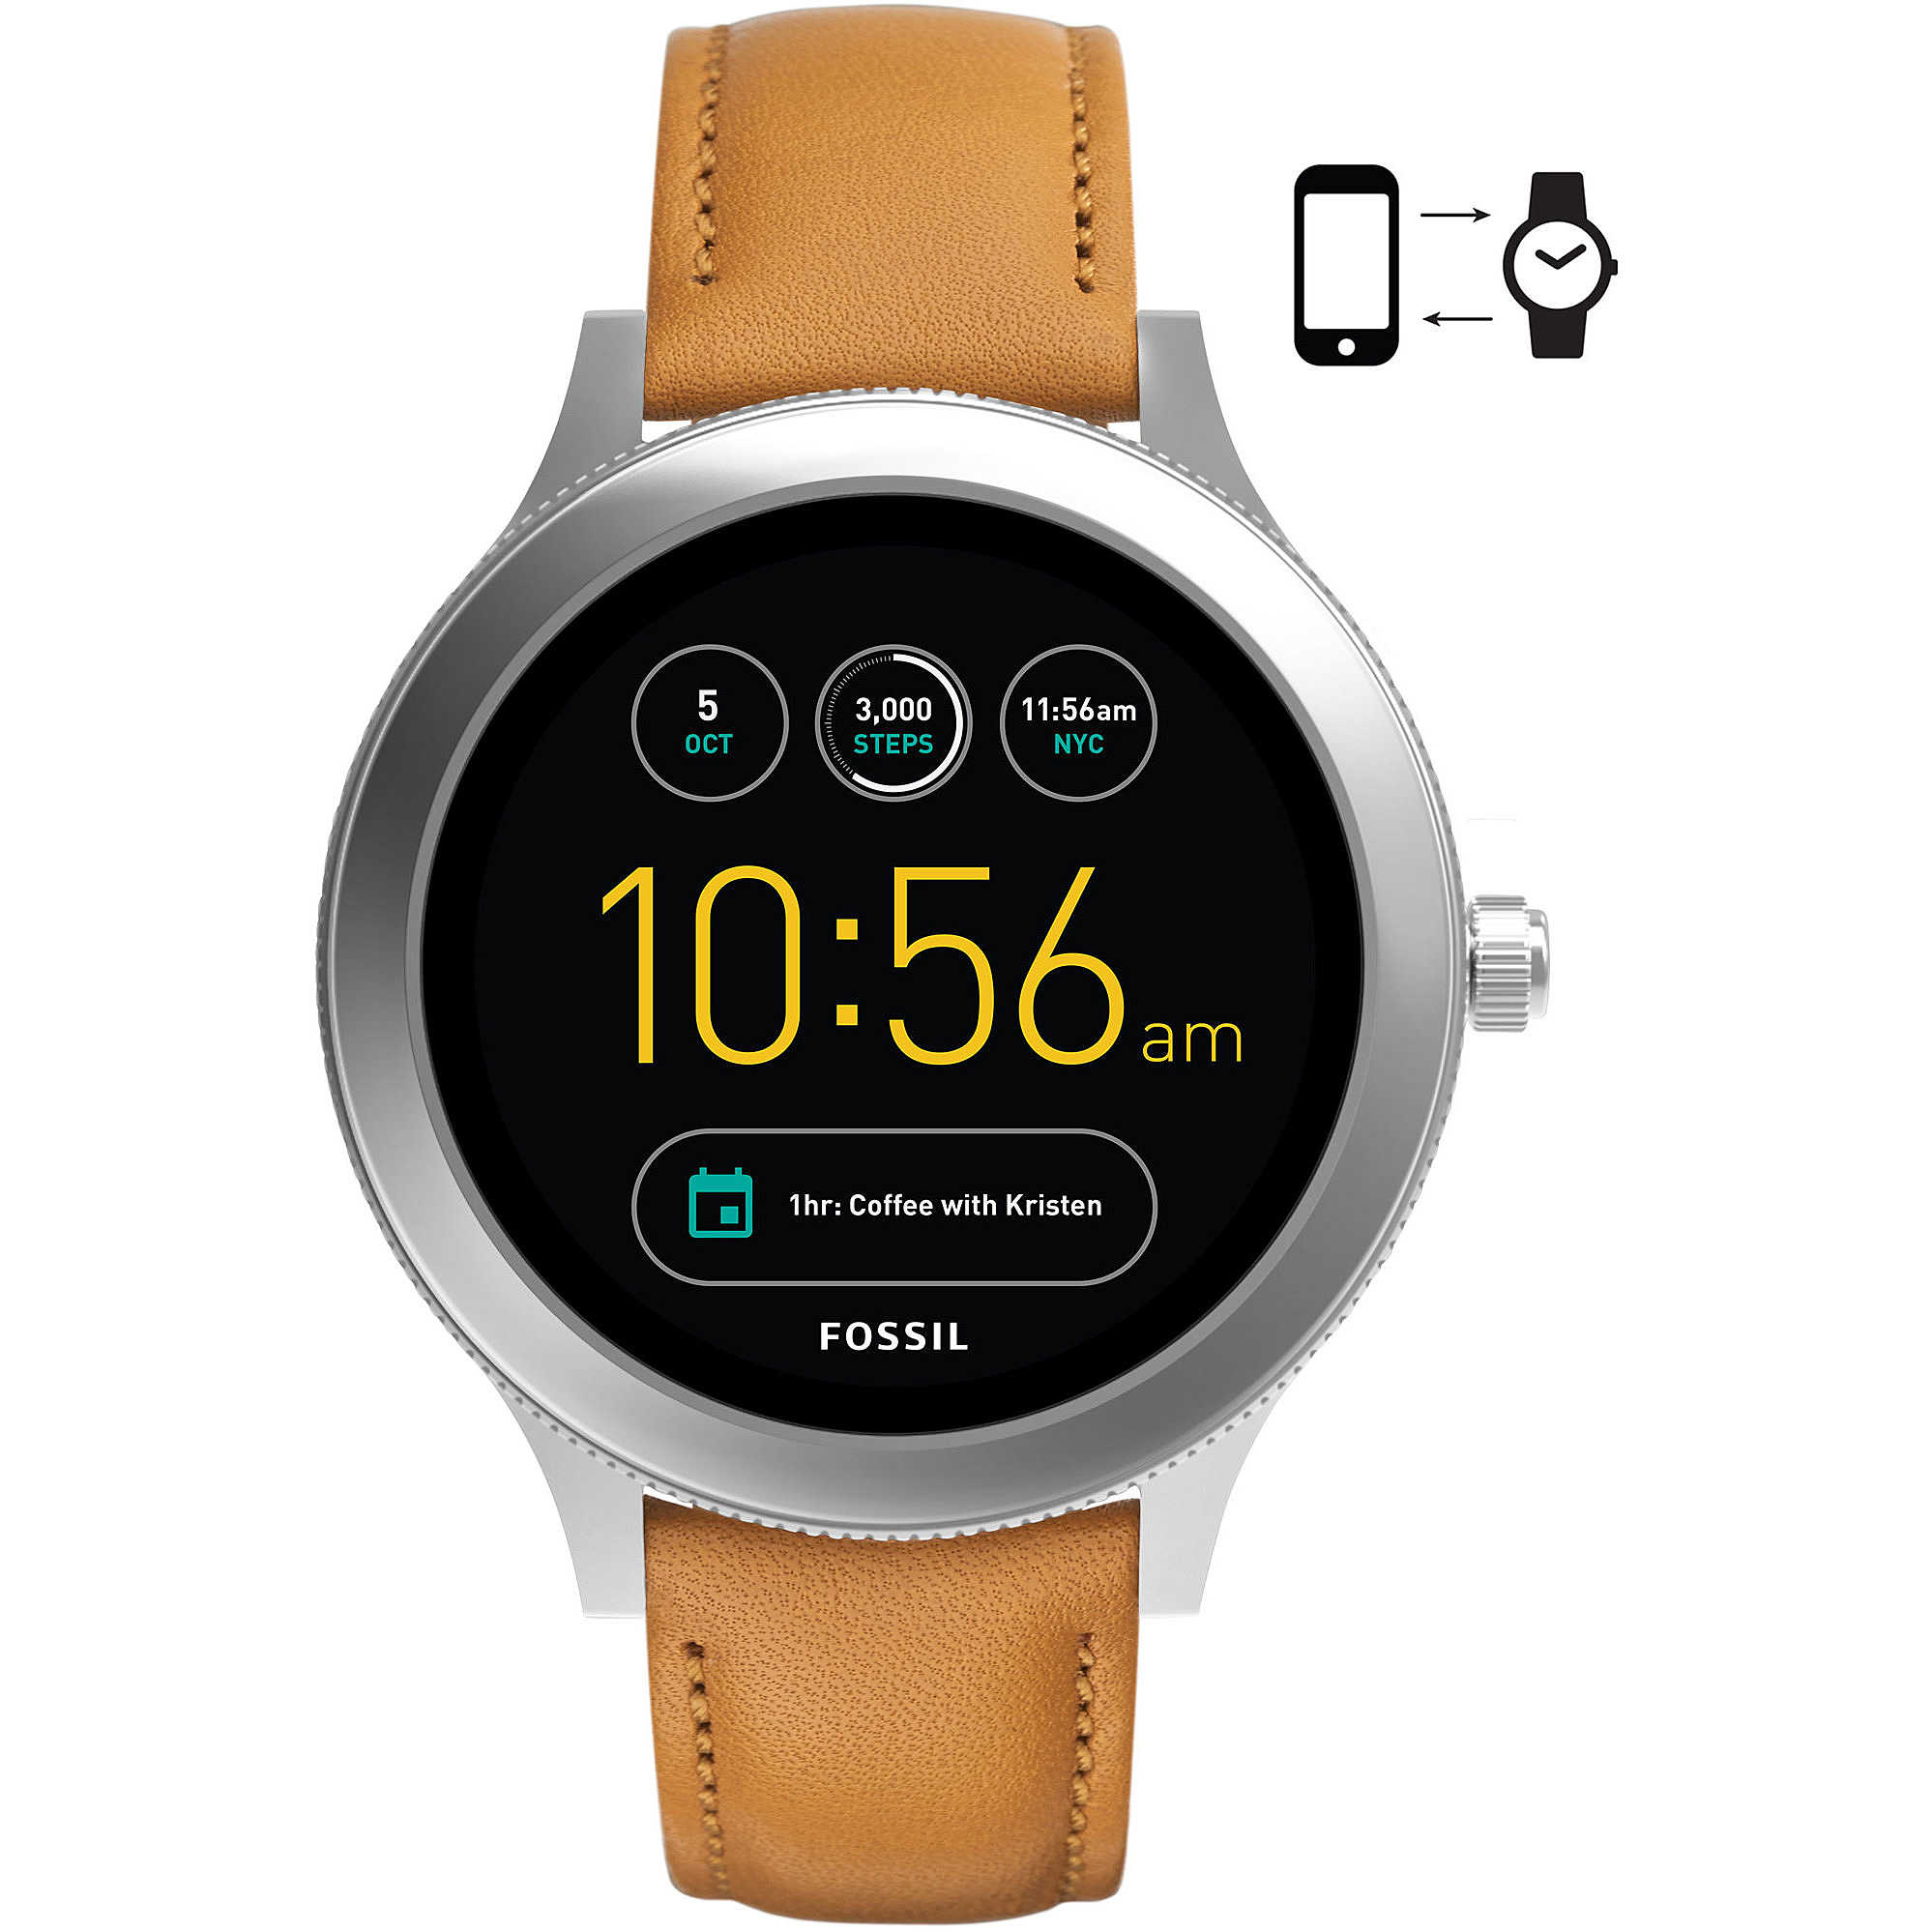 Q Smartwatch Smartwatches Fossil Ftw6007 Orologio Donna Venture D9WIHE2Y